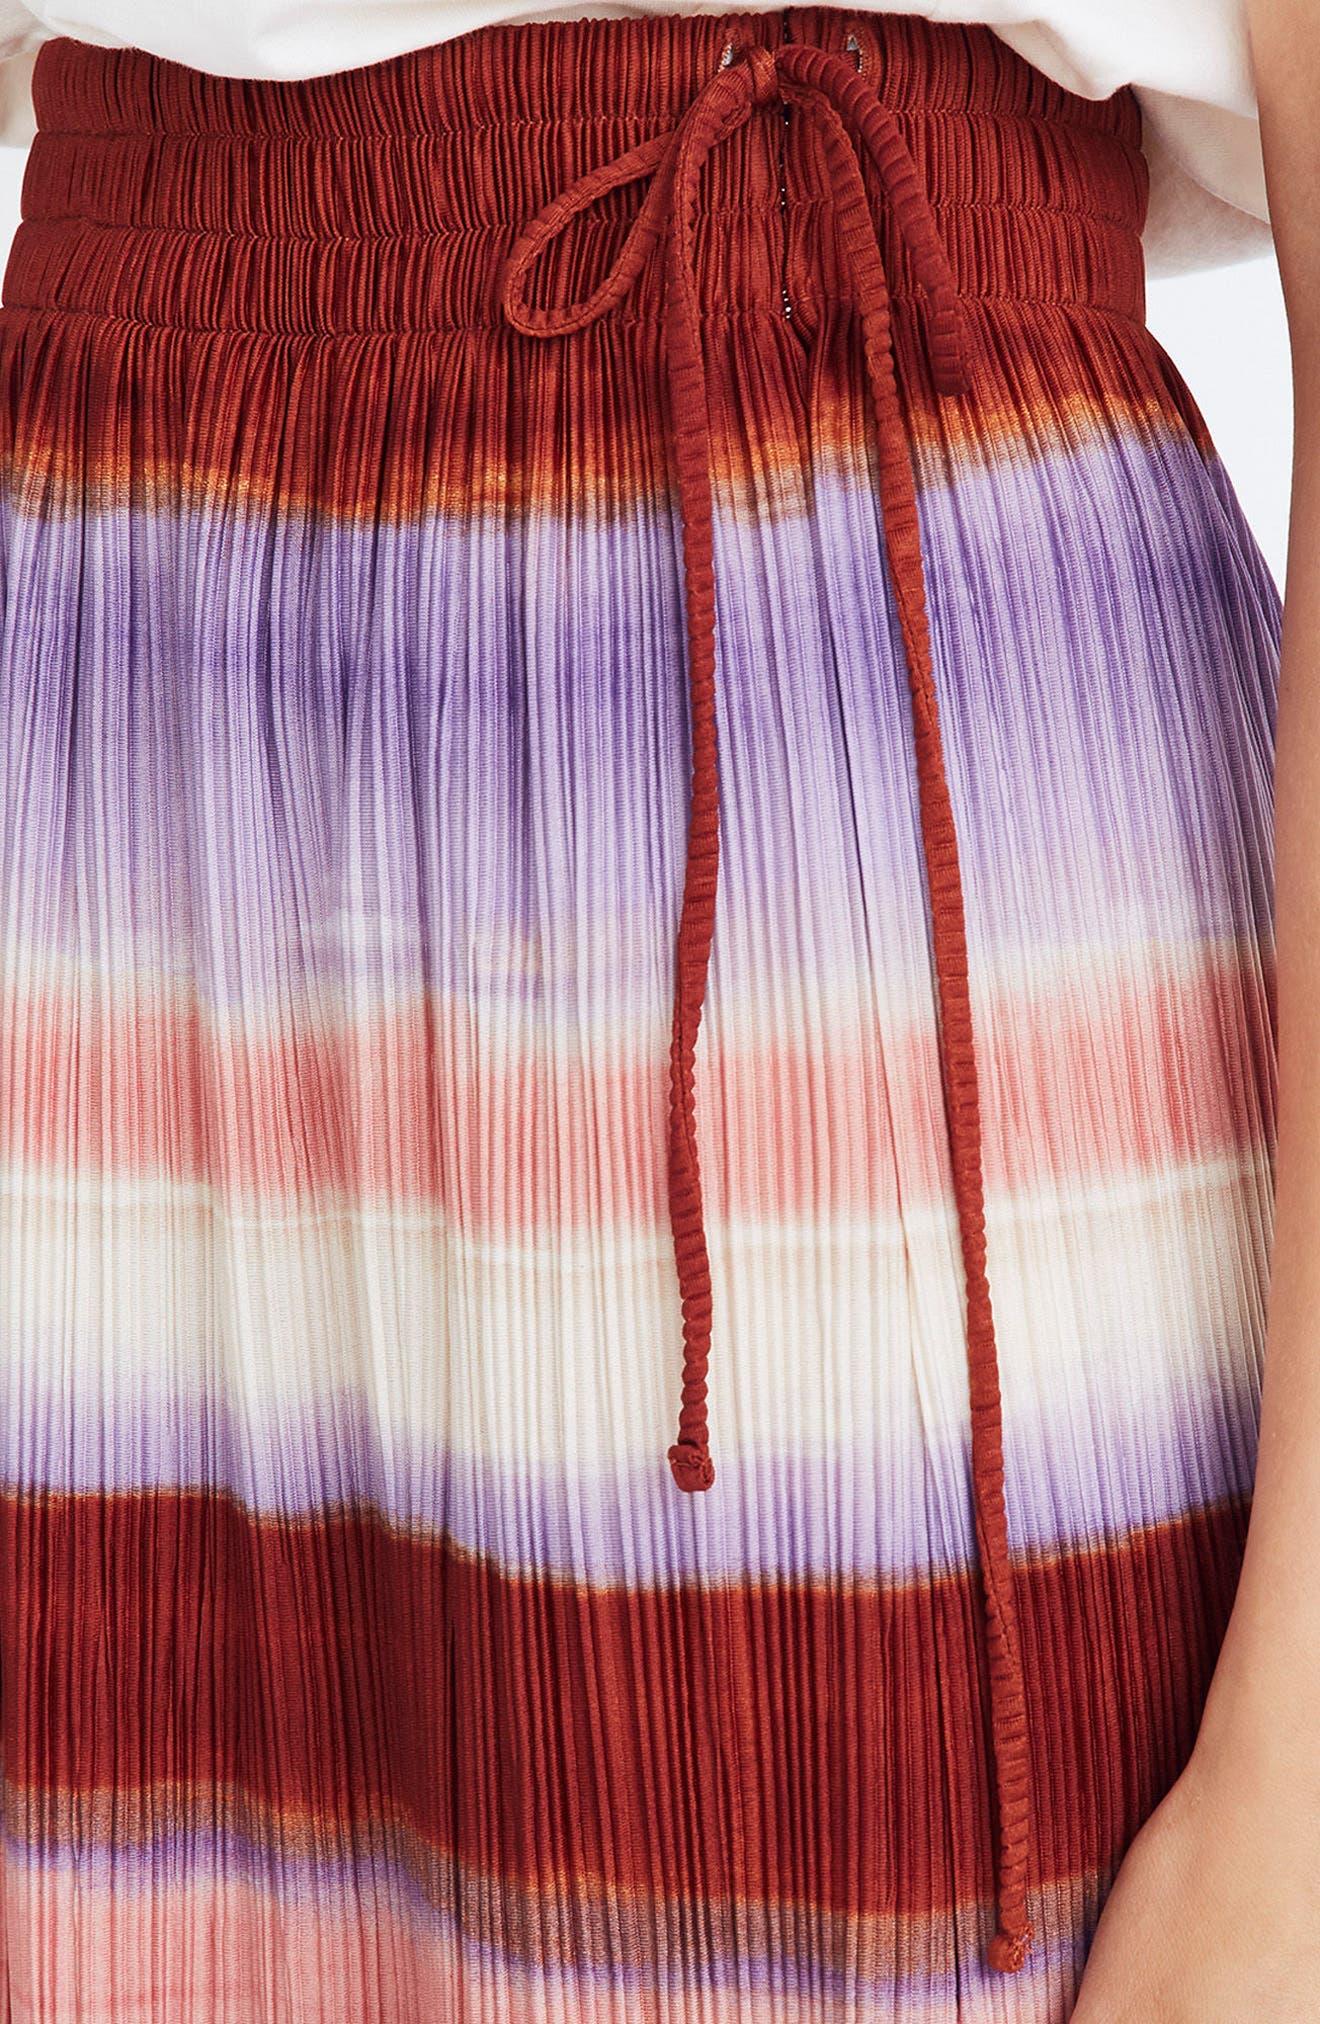 Texture & Thread Ombré Rainbow Micropleat Midi Skirt,                             Alternate thumbnail 3, color,                             Clementine Cream